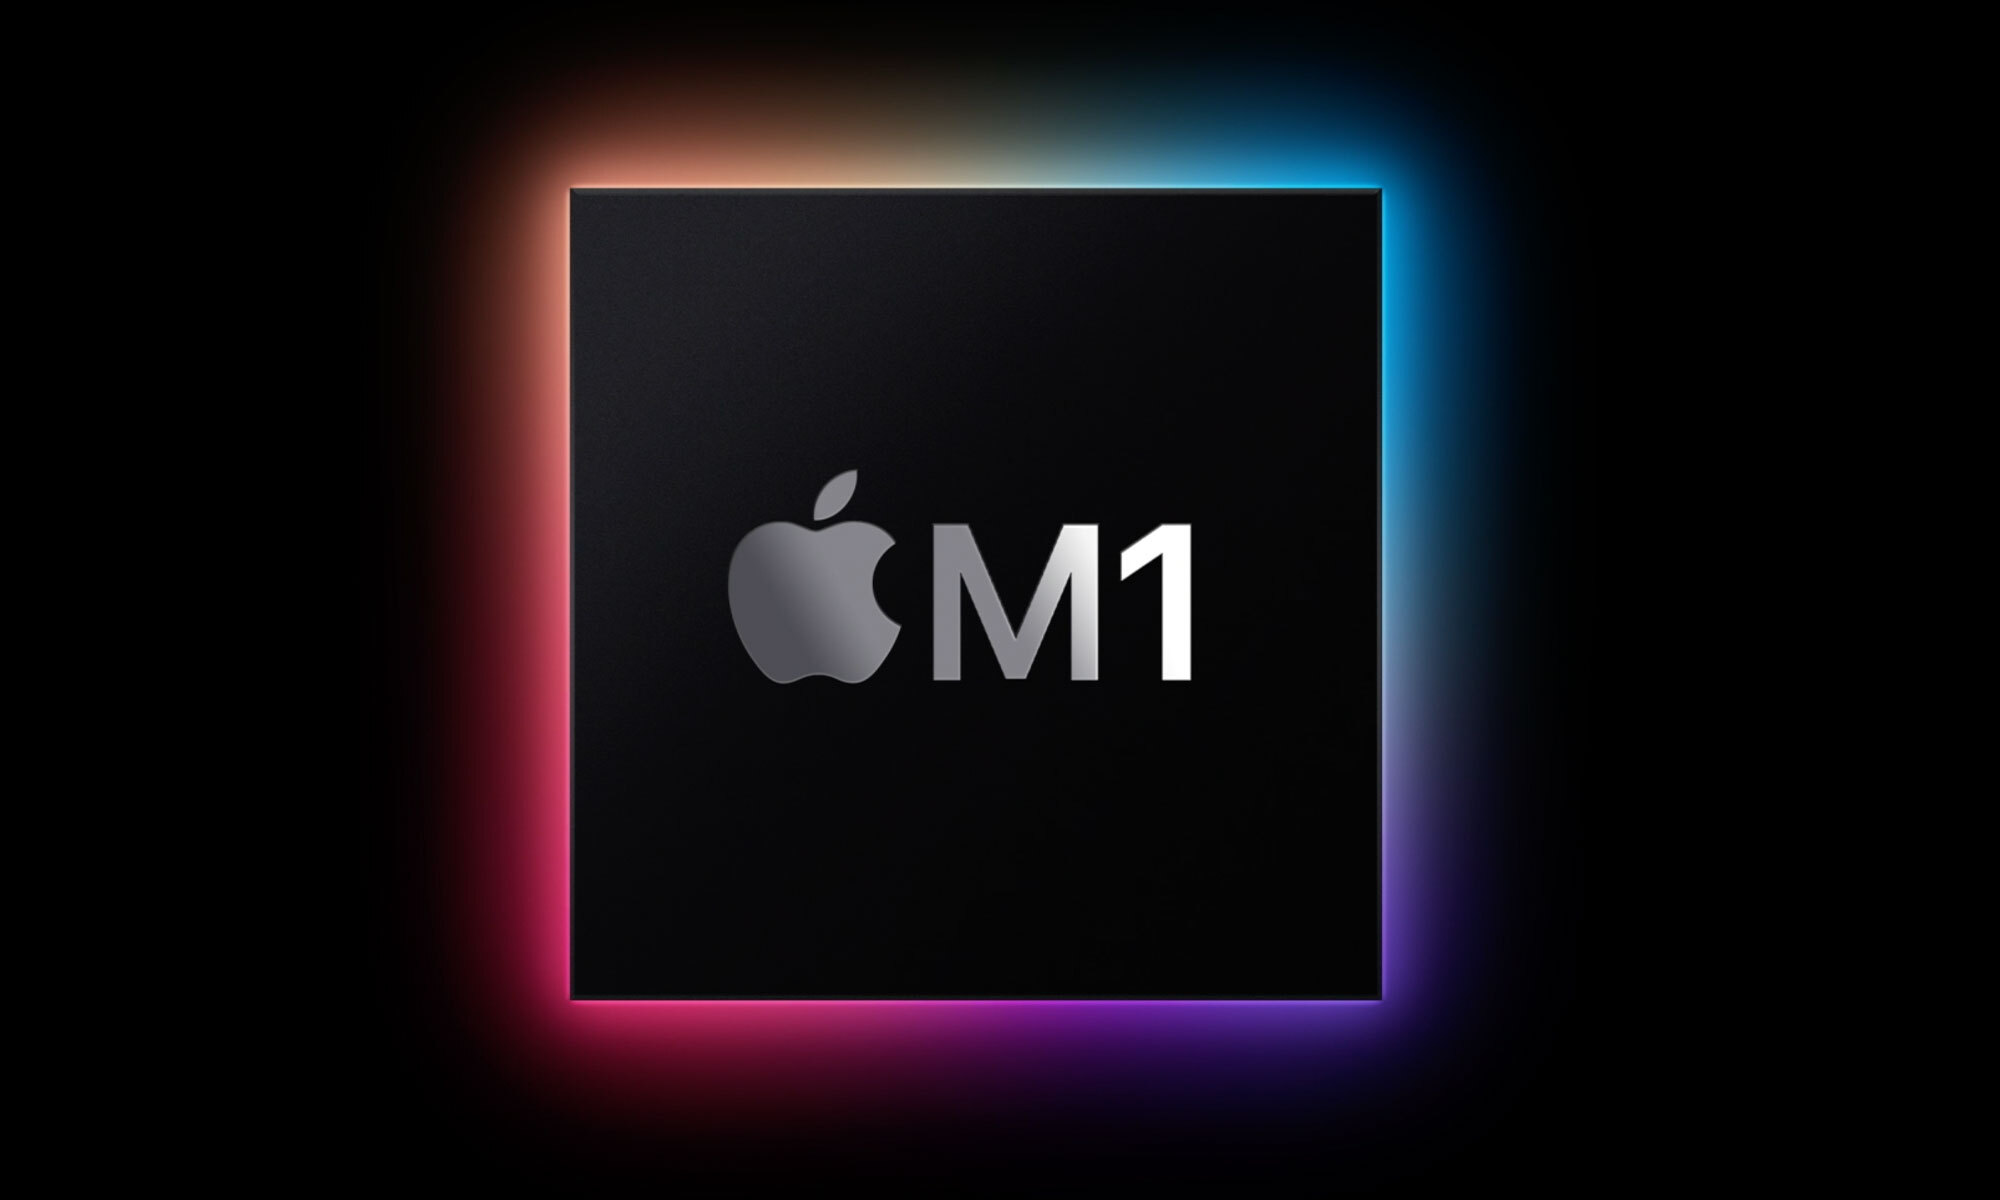 macbook m1 git clone指令無法使用?